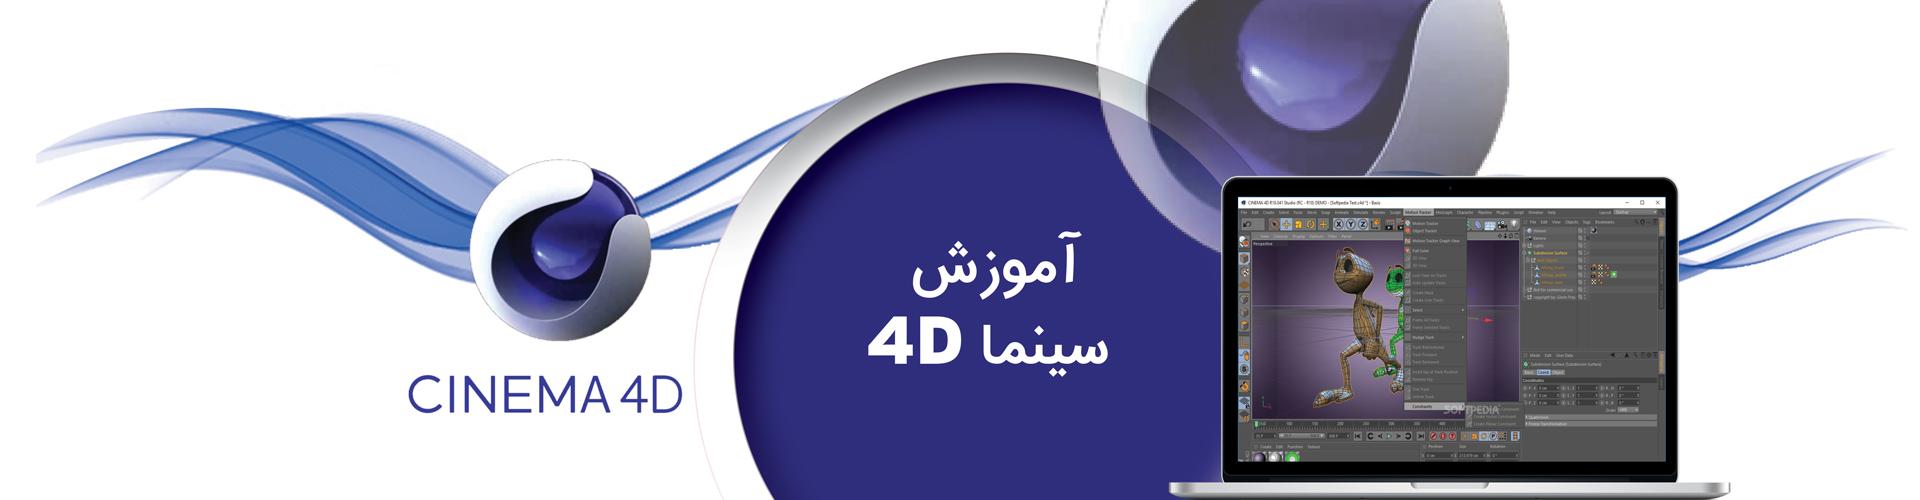 cinema4d slider - سینما فوردی ، Cinema 4D